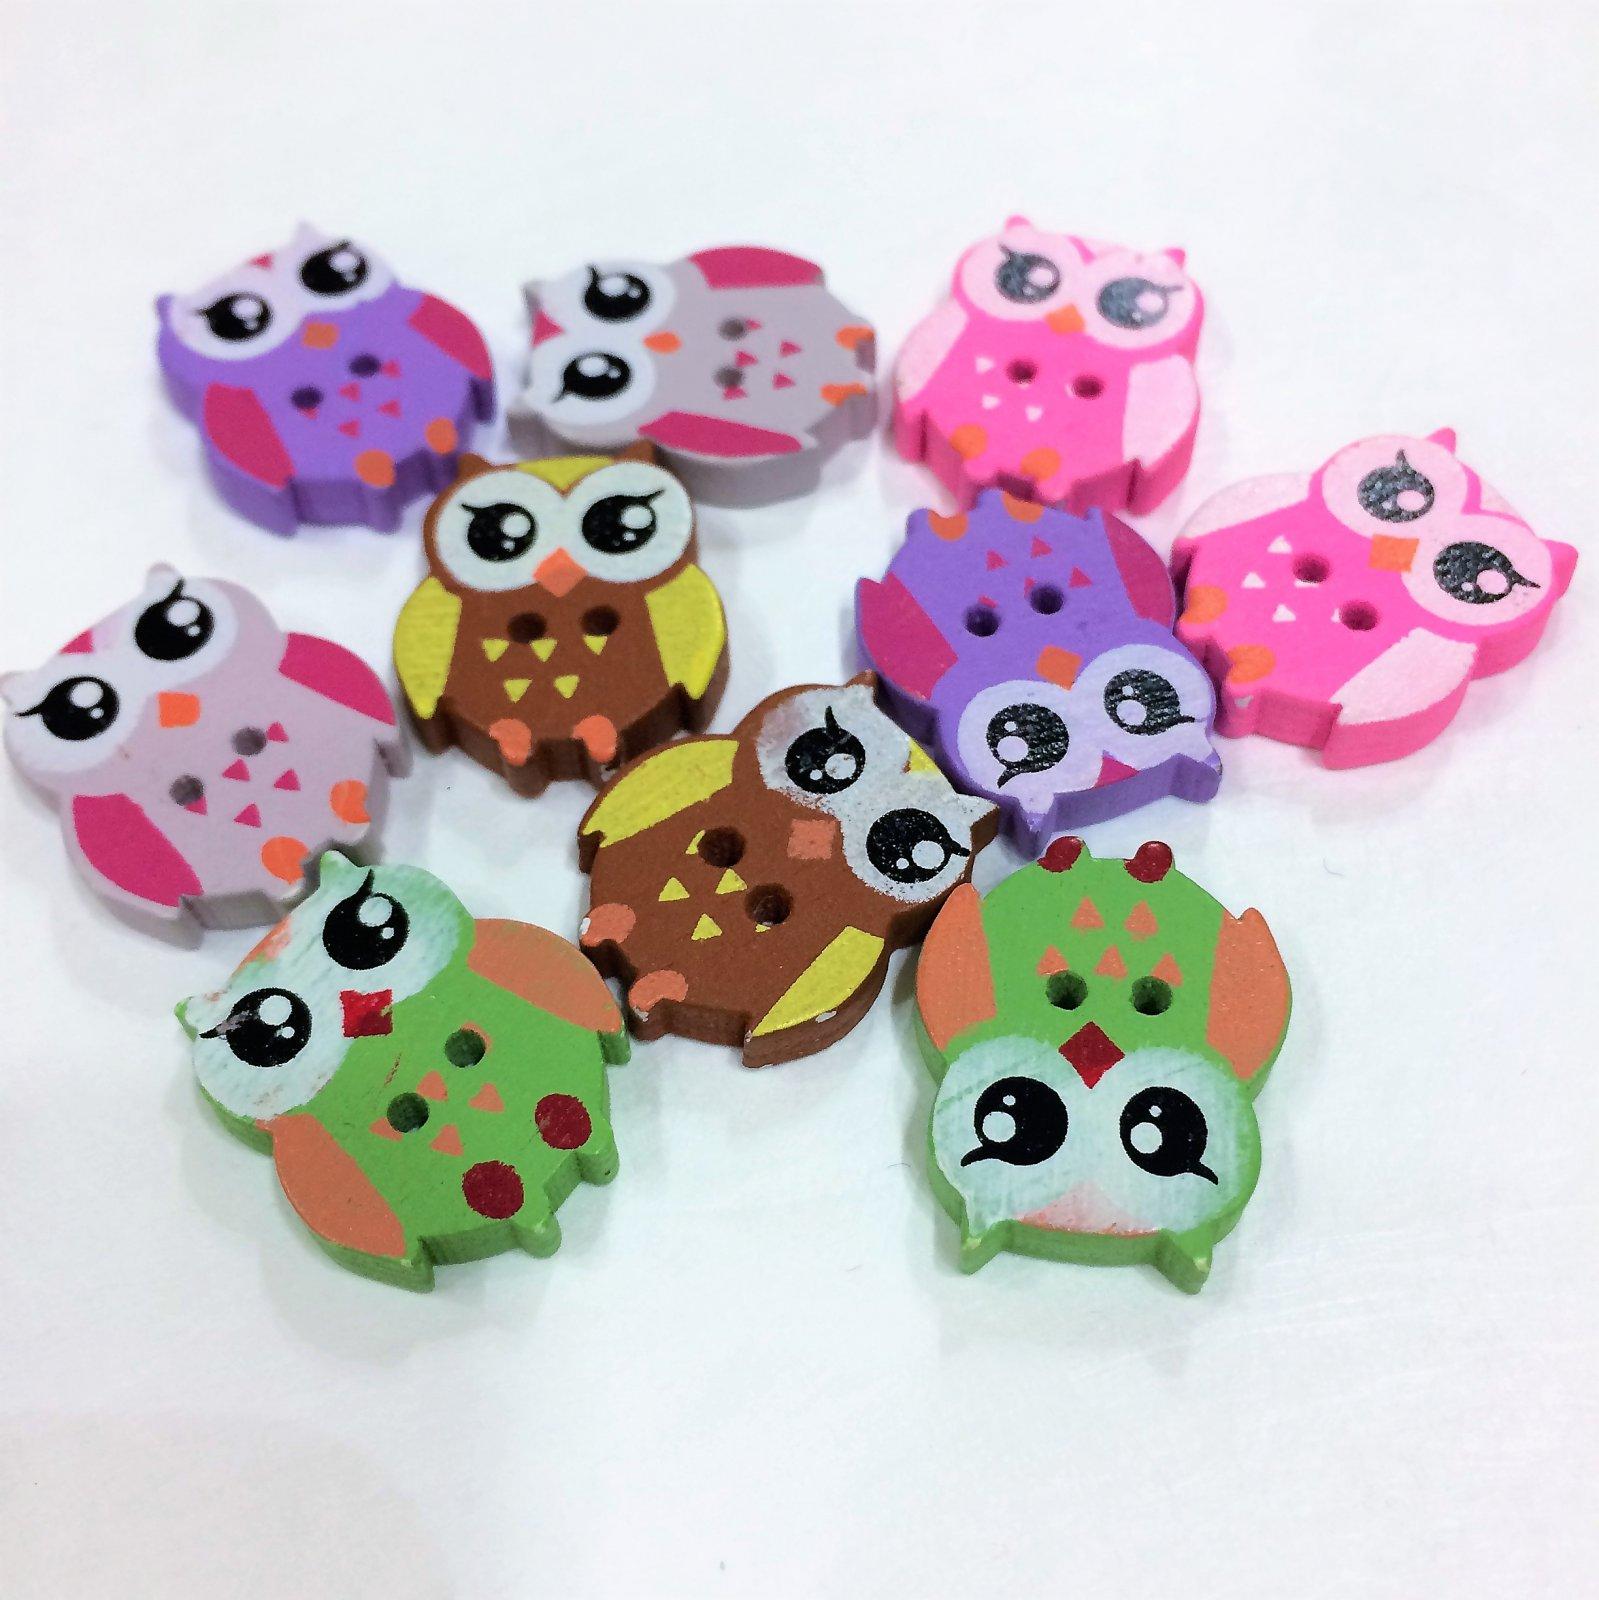 Wood Owls - Assorted Colors